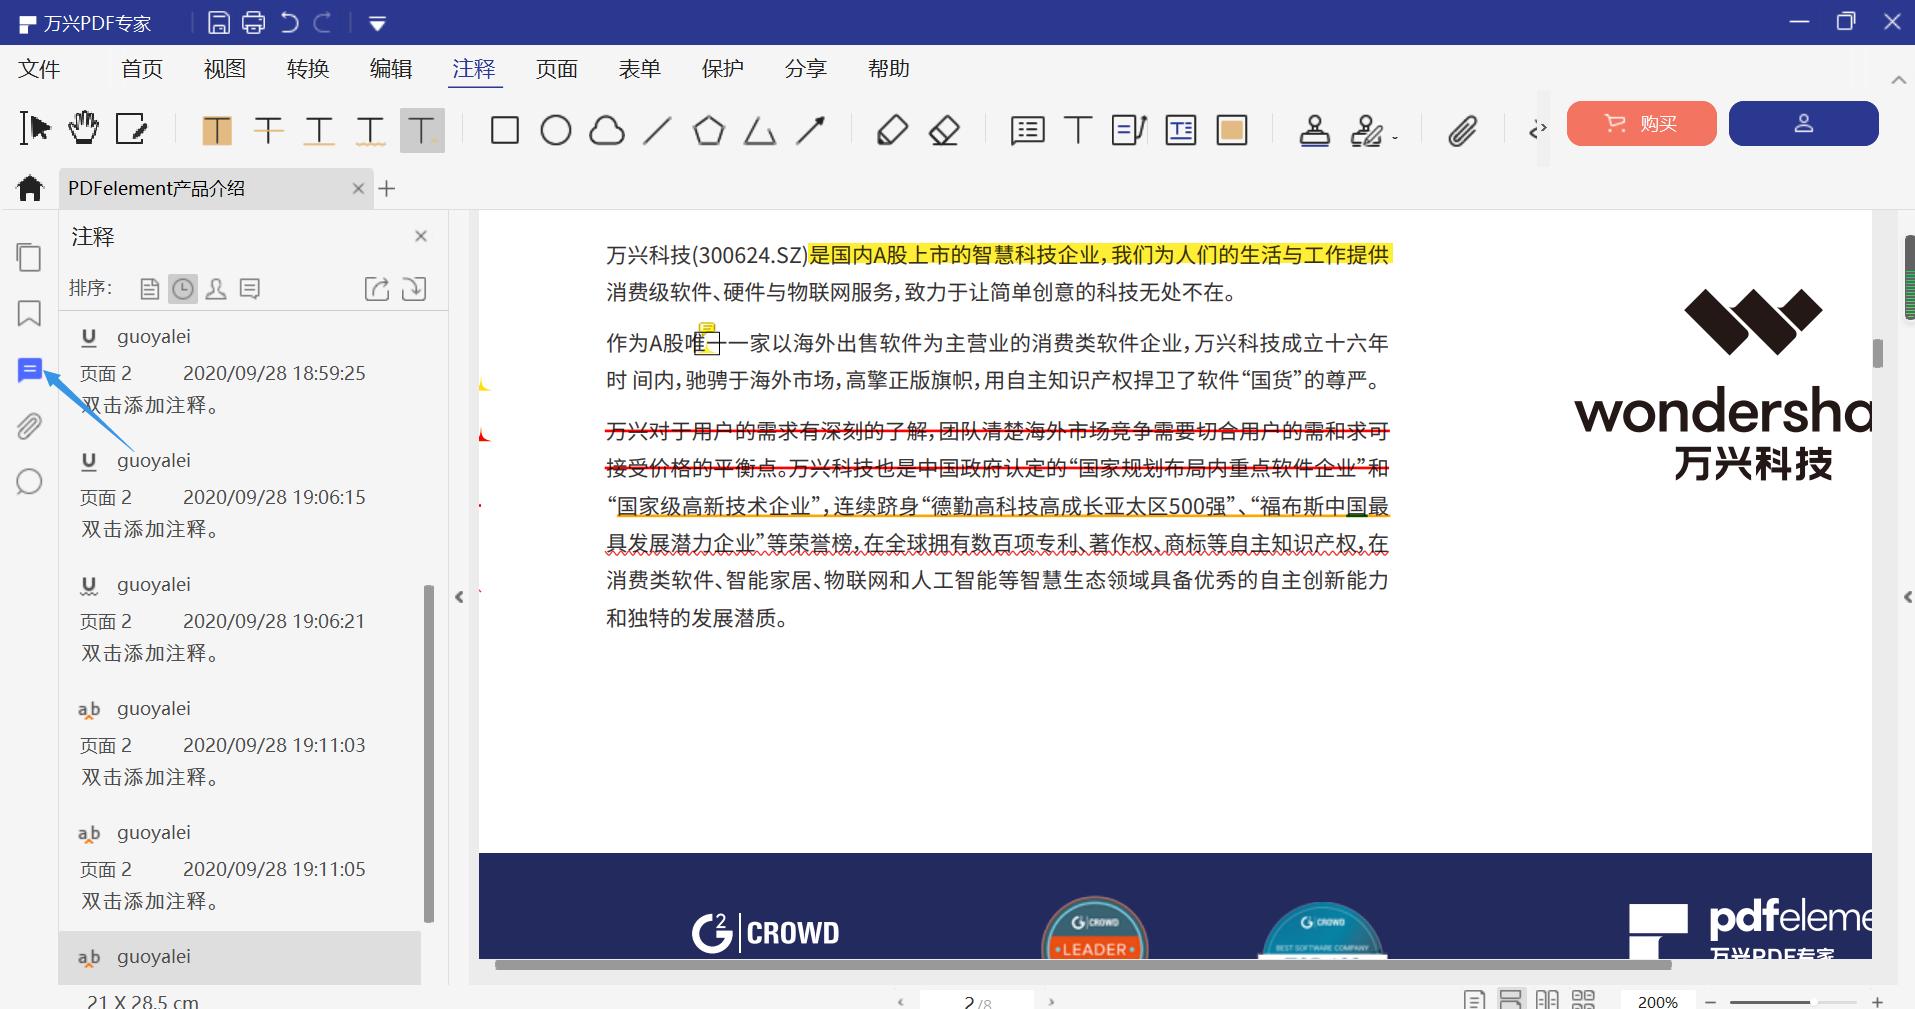 PDF文档注释步骤5